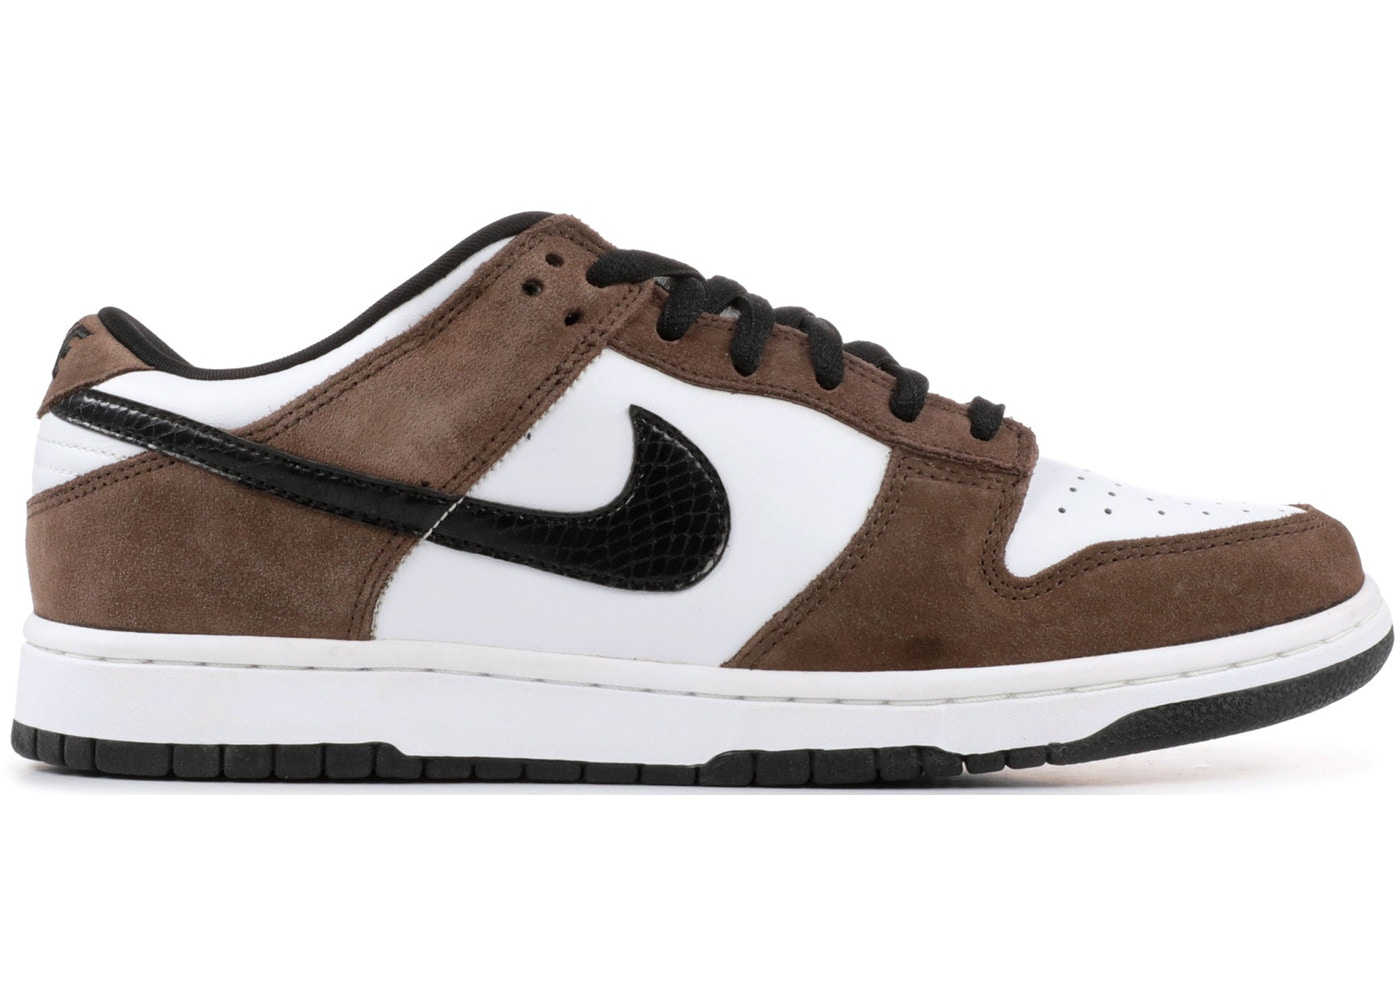 meet 647b2 0f95e Nike SB Shoes - Volatility